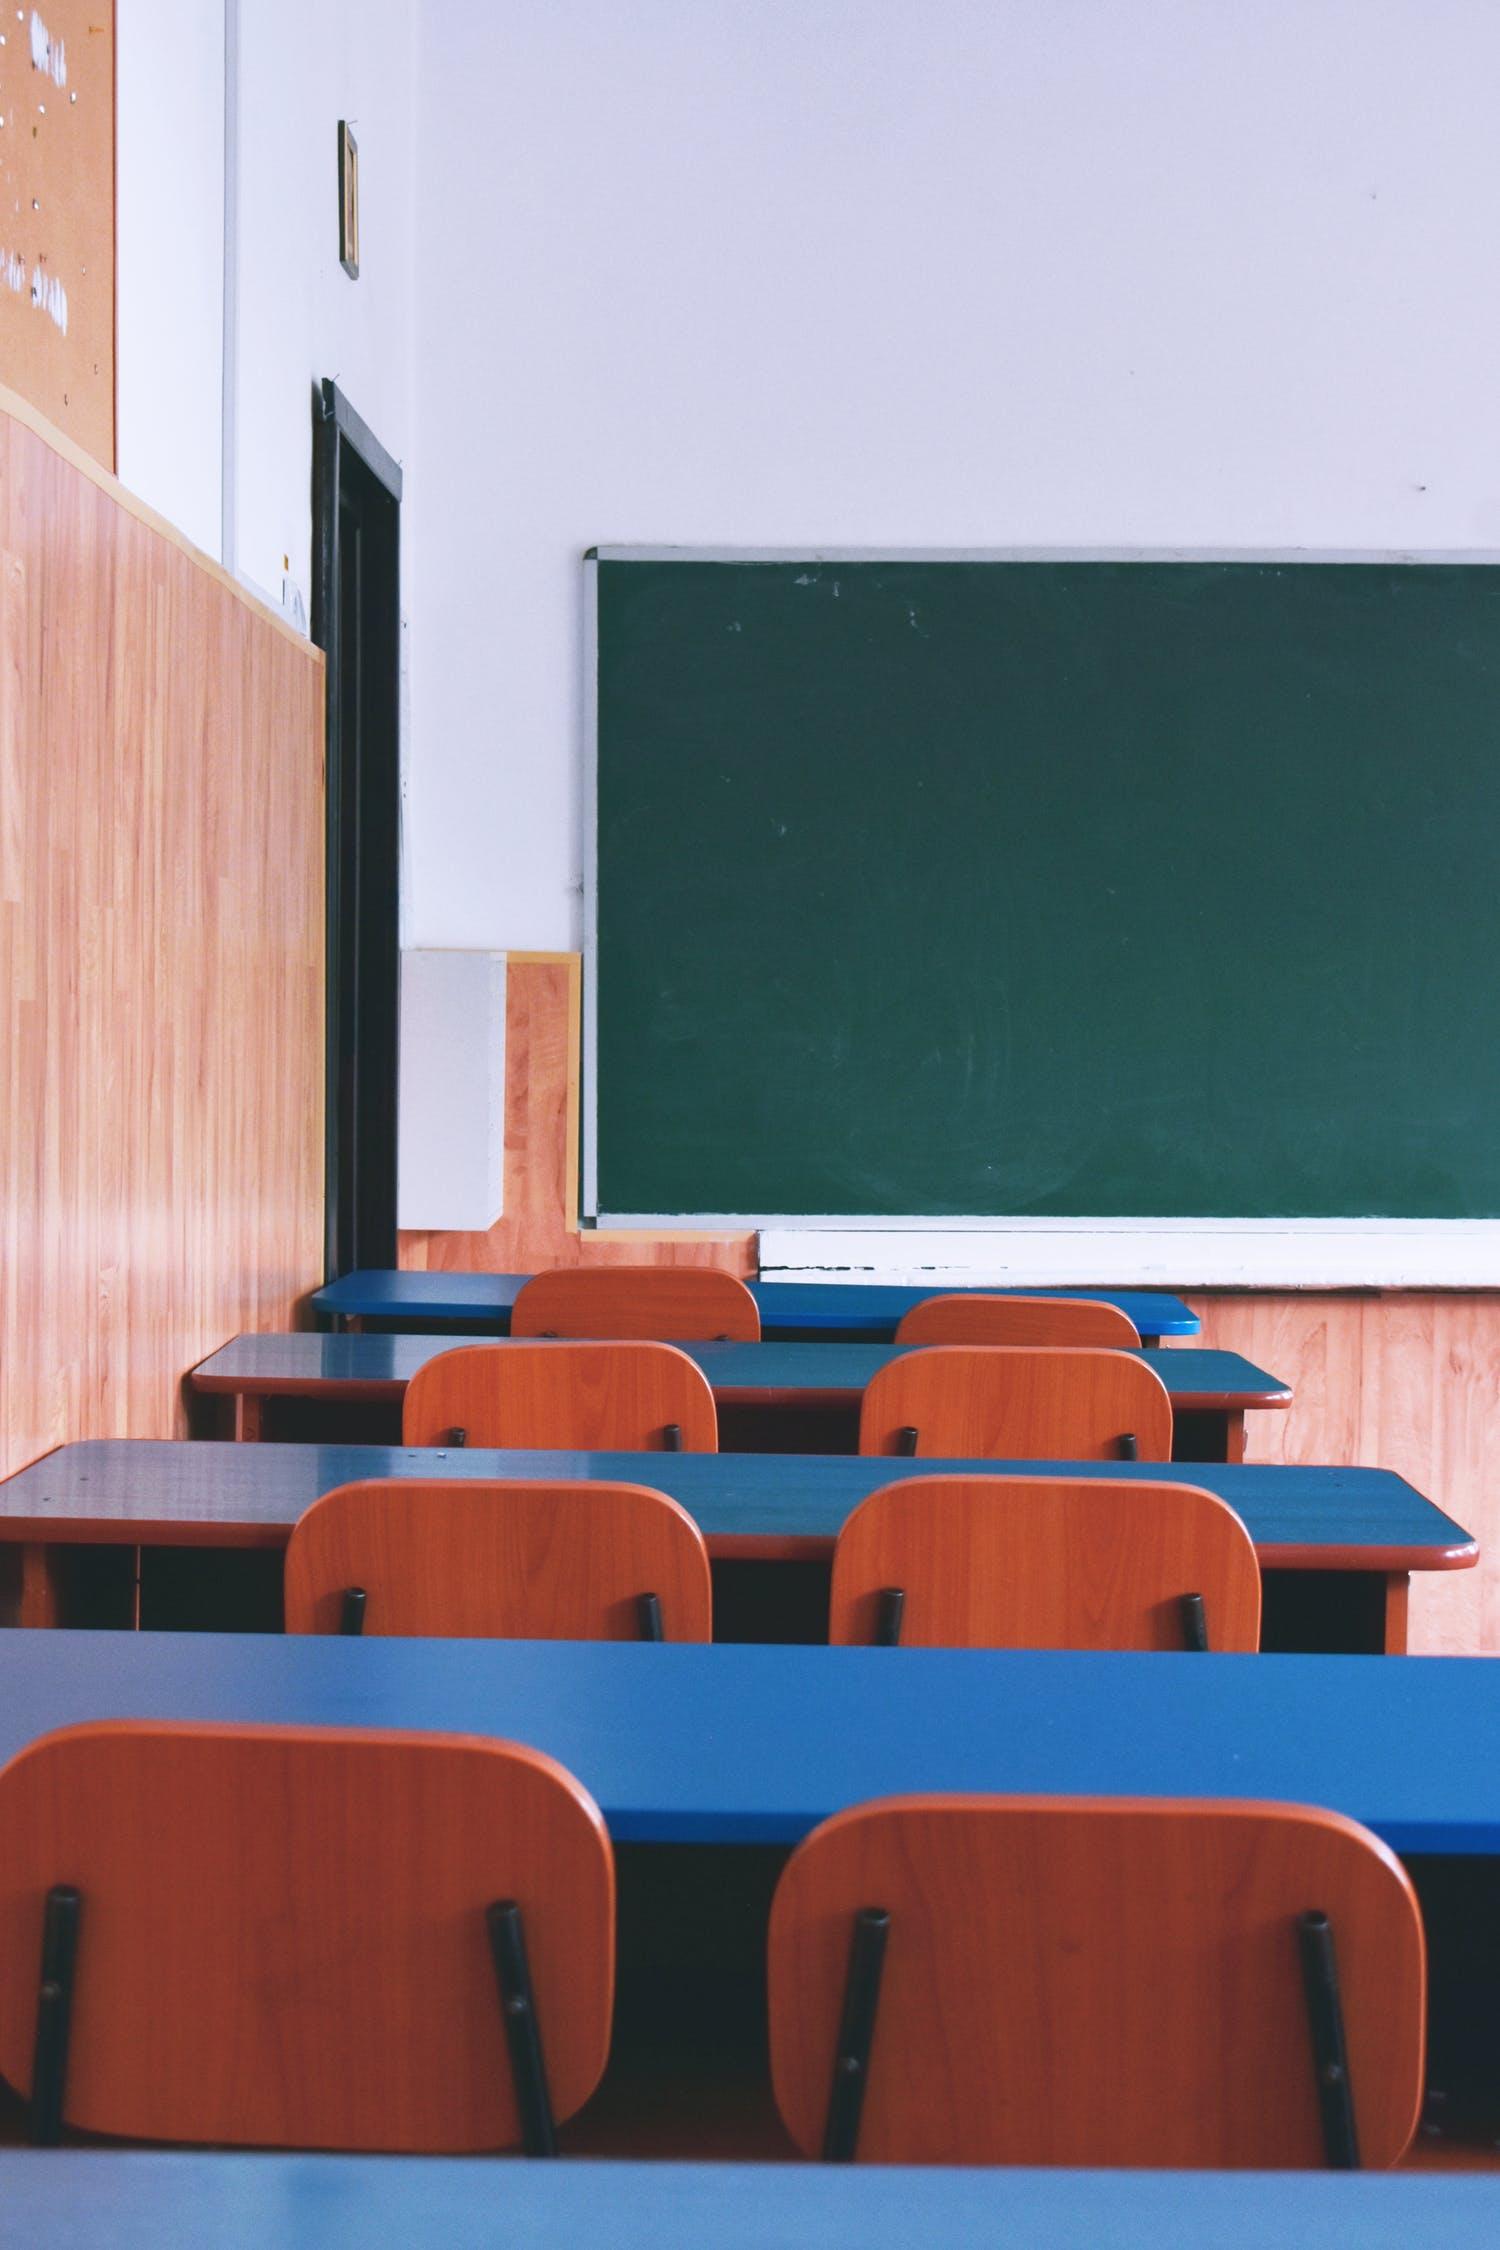 More Plaintiffs Added to Former Teacher's Sex Abuse Case